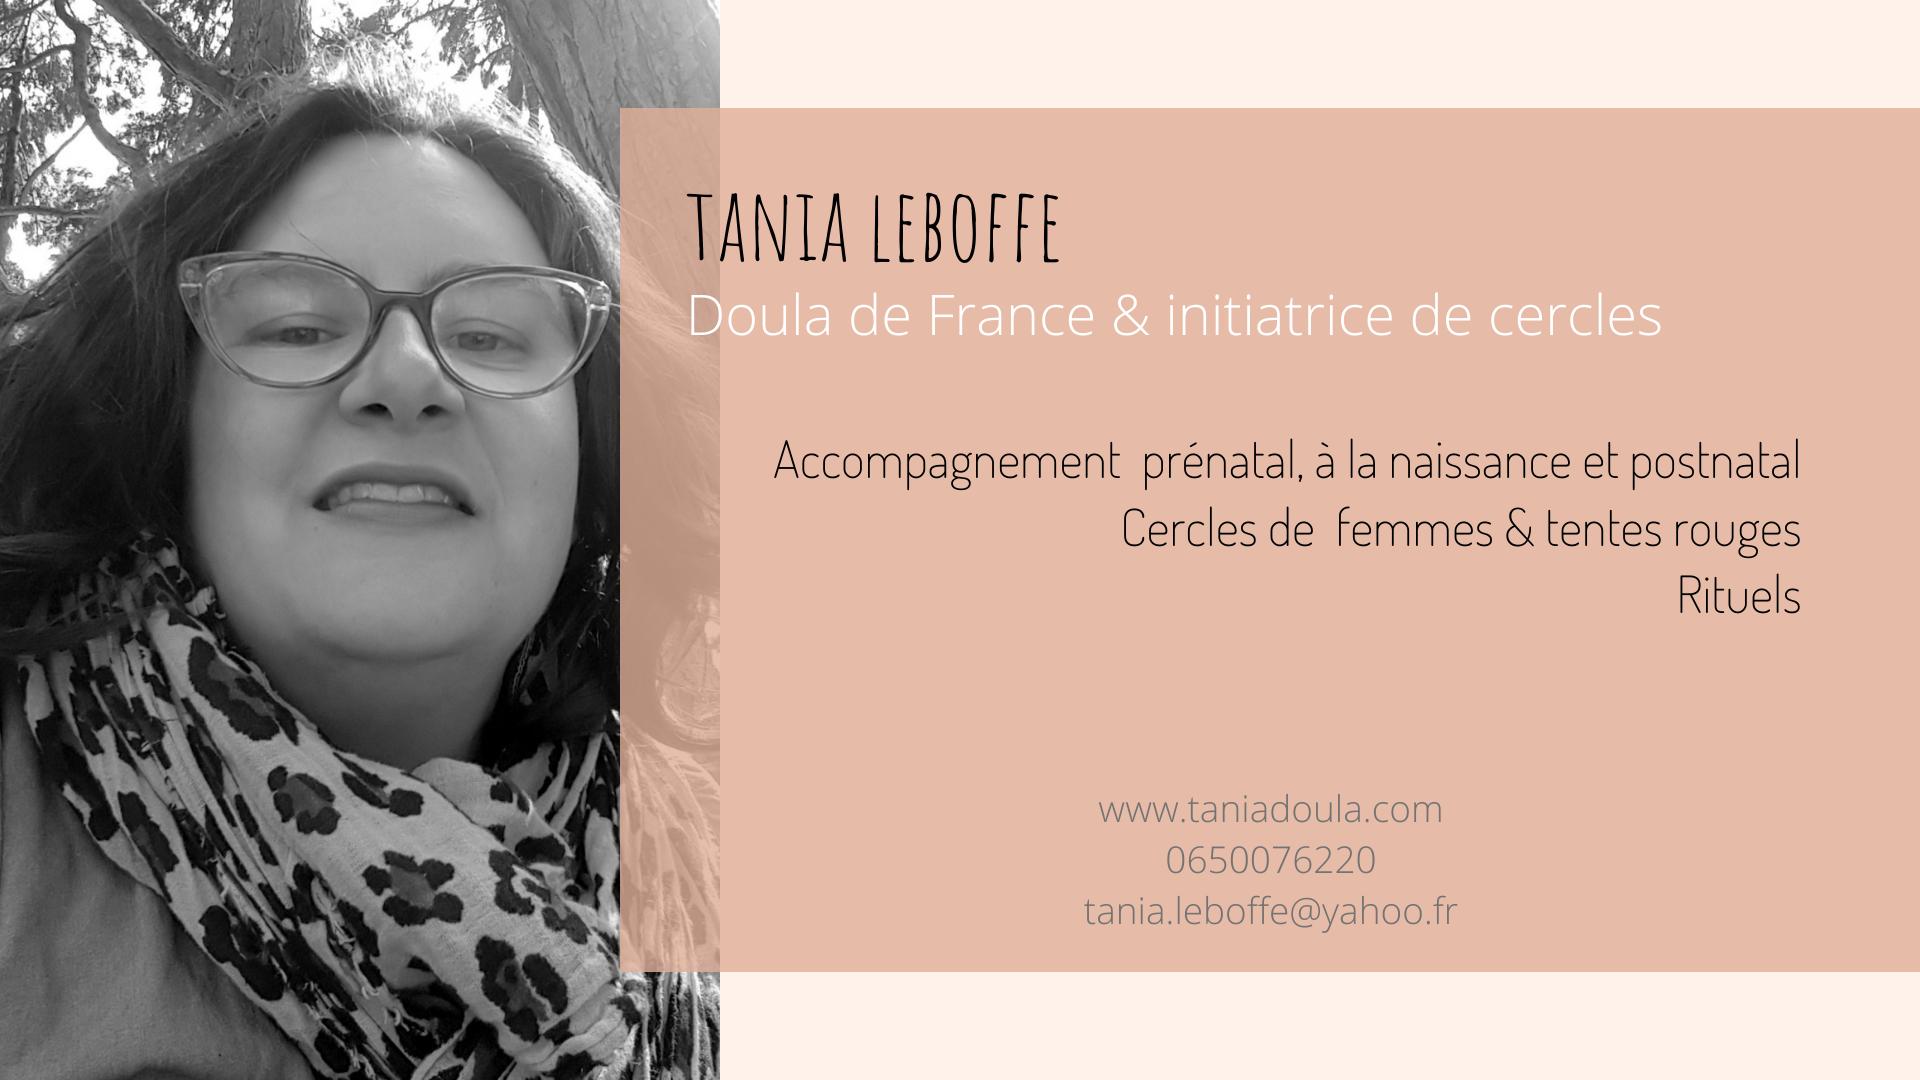 Tania Leboffe